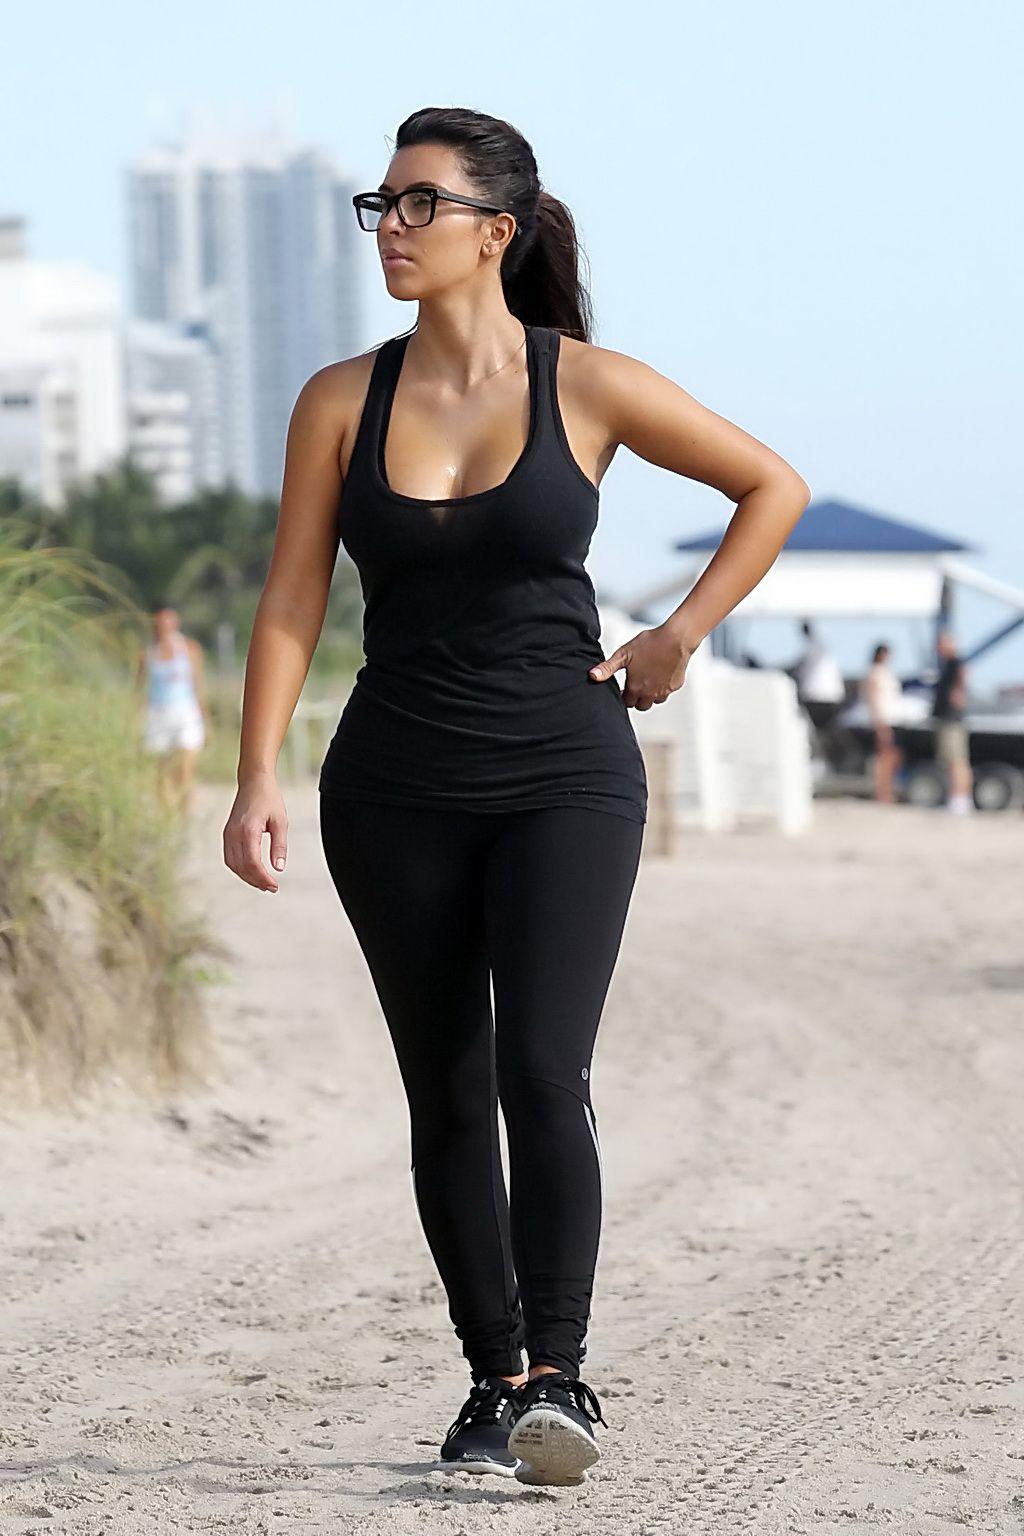 Kim Kardashian flaunts 119lb figure in eye popping bikini